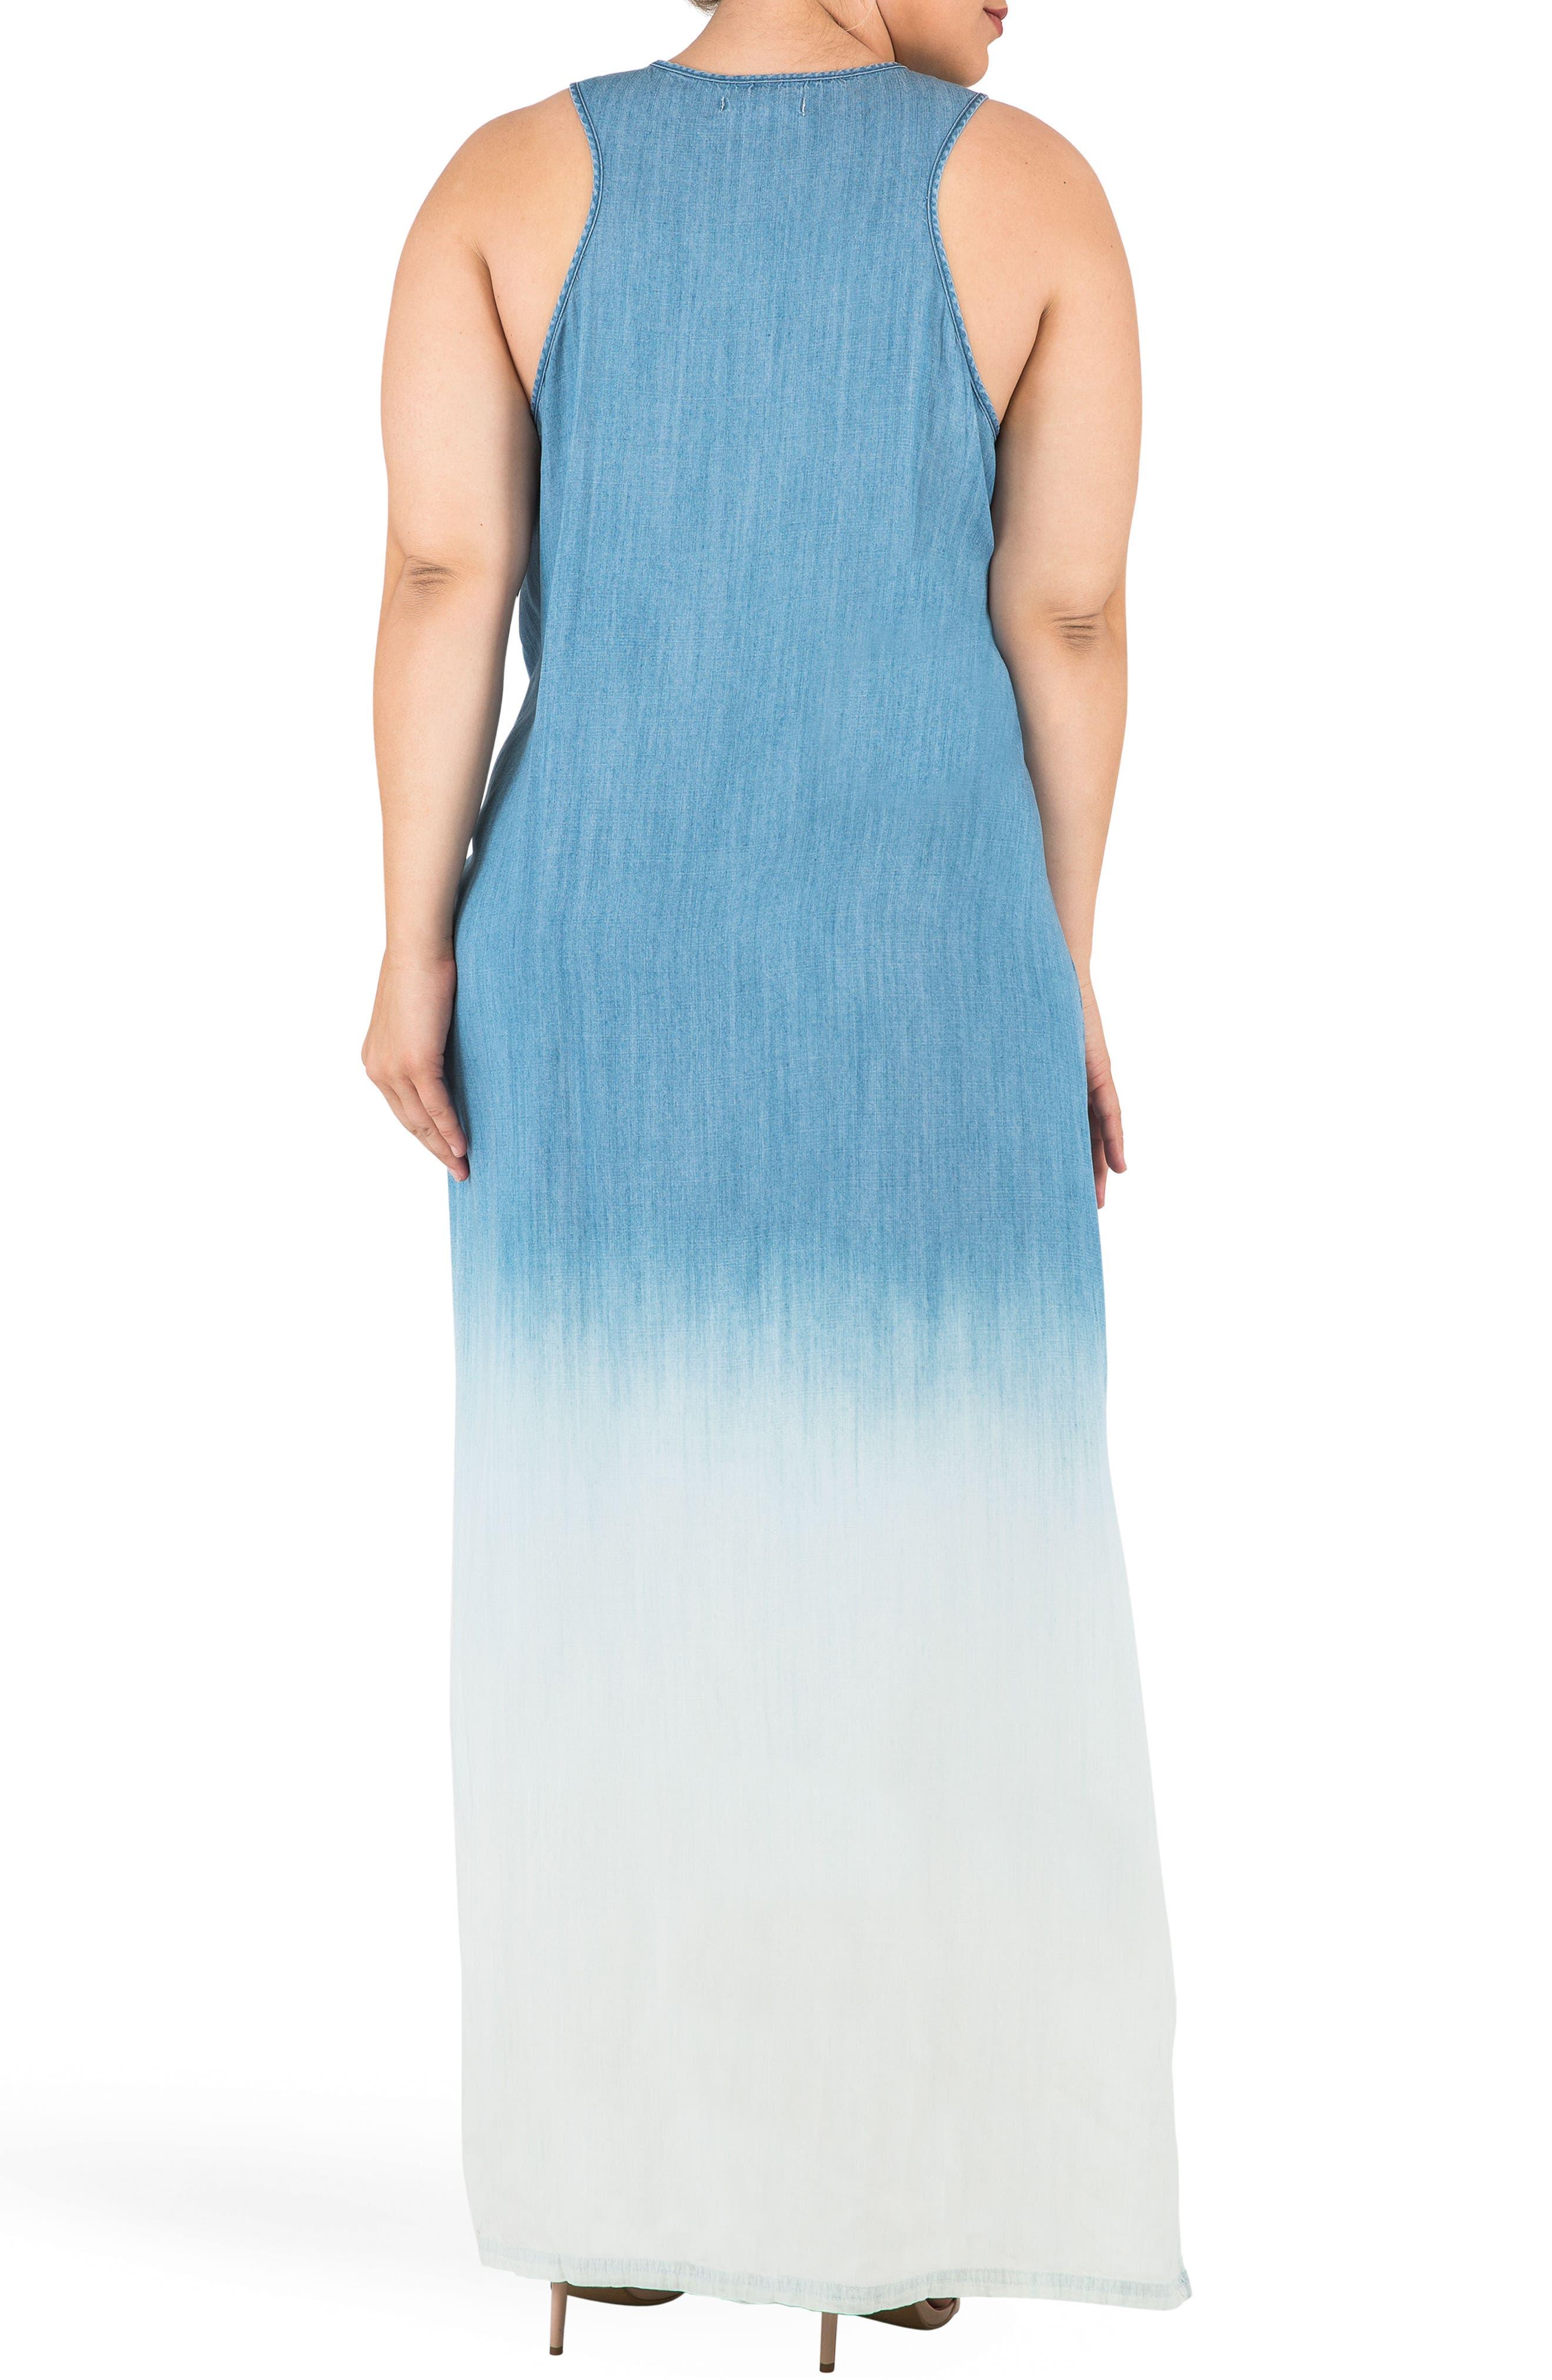 Angie Ombré Chmbray Maxi Dress,                             Alternate thumbnail 2, color,                             Blue